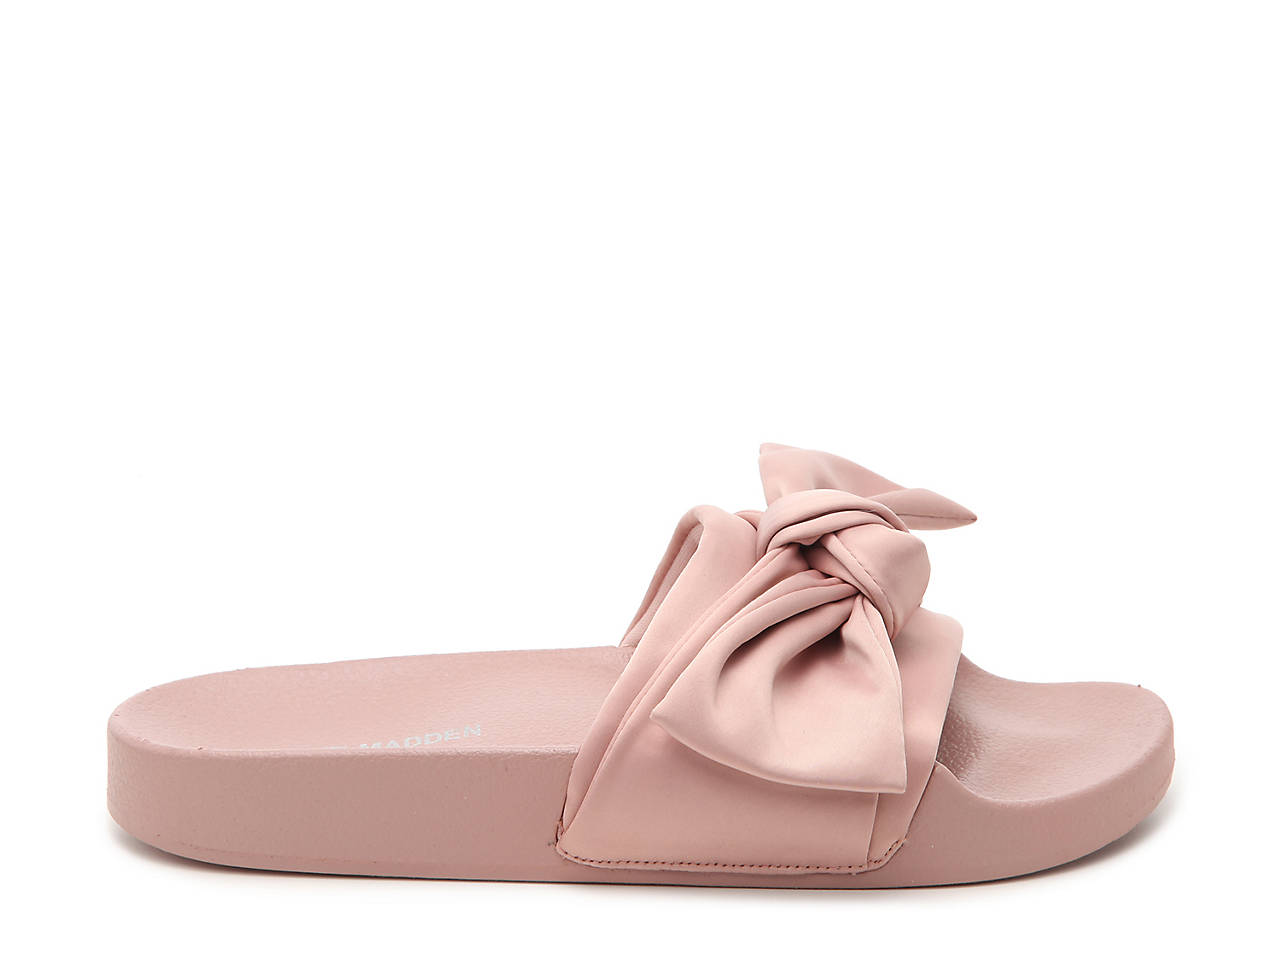 c0afe46bdde Steve Madden Silky Slide Sandal Women s Shoes